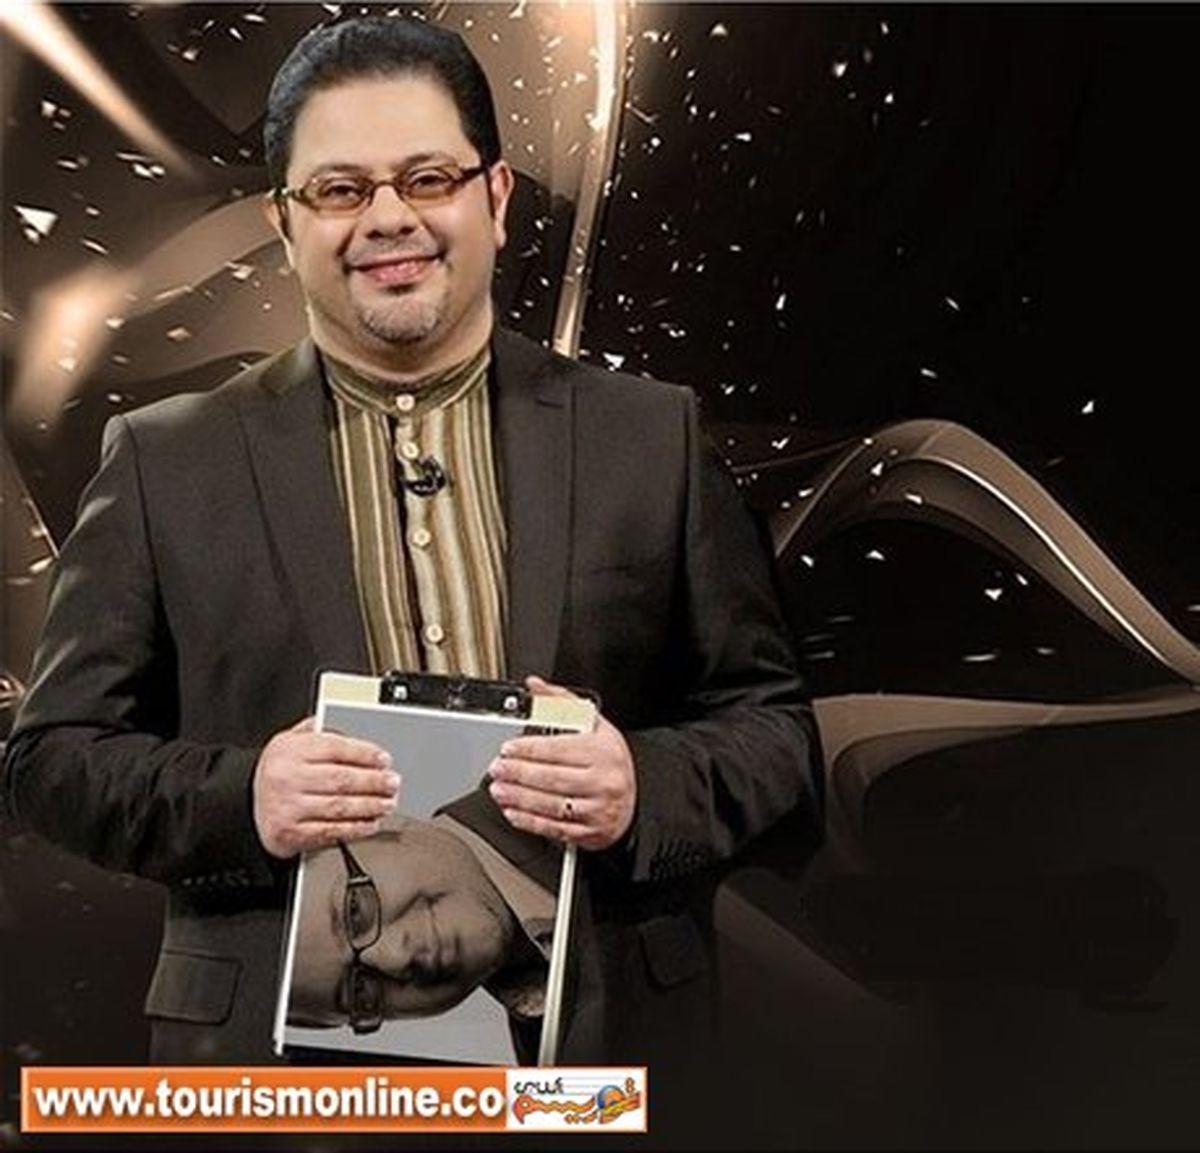 بازگشت مجری مشهور ممنوع التصویر به تلویزیون! +عکس